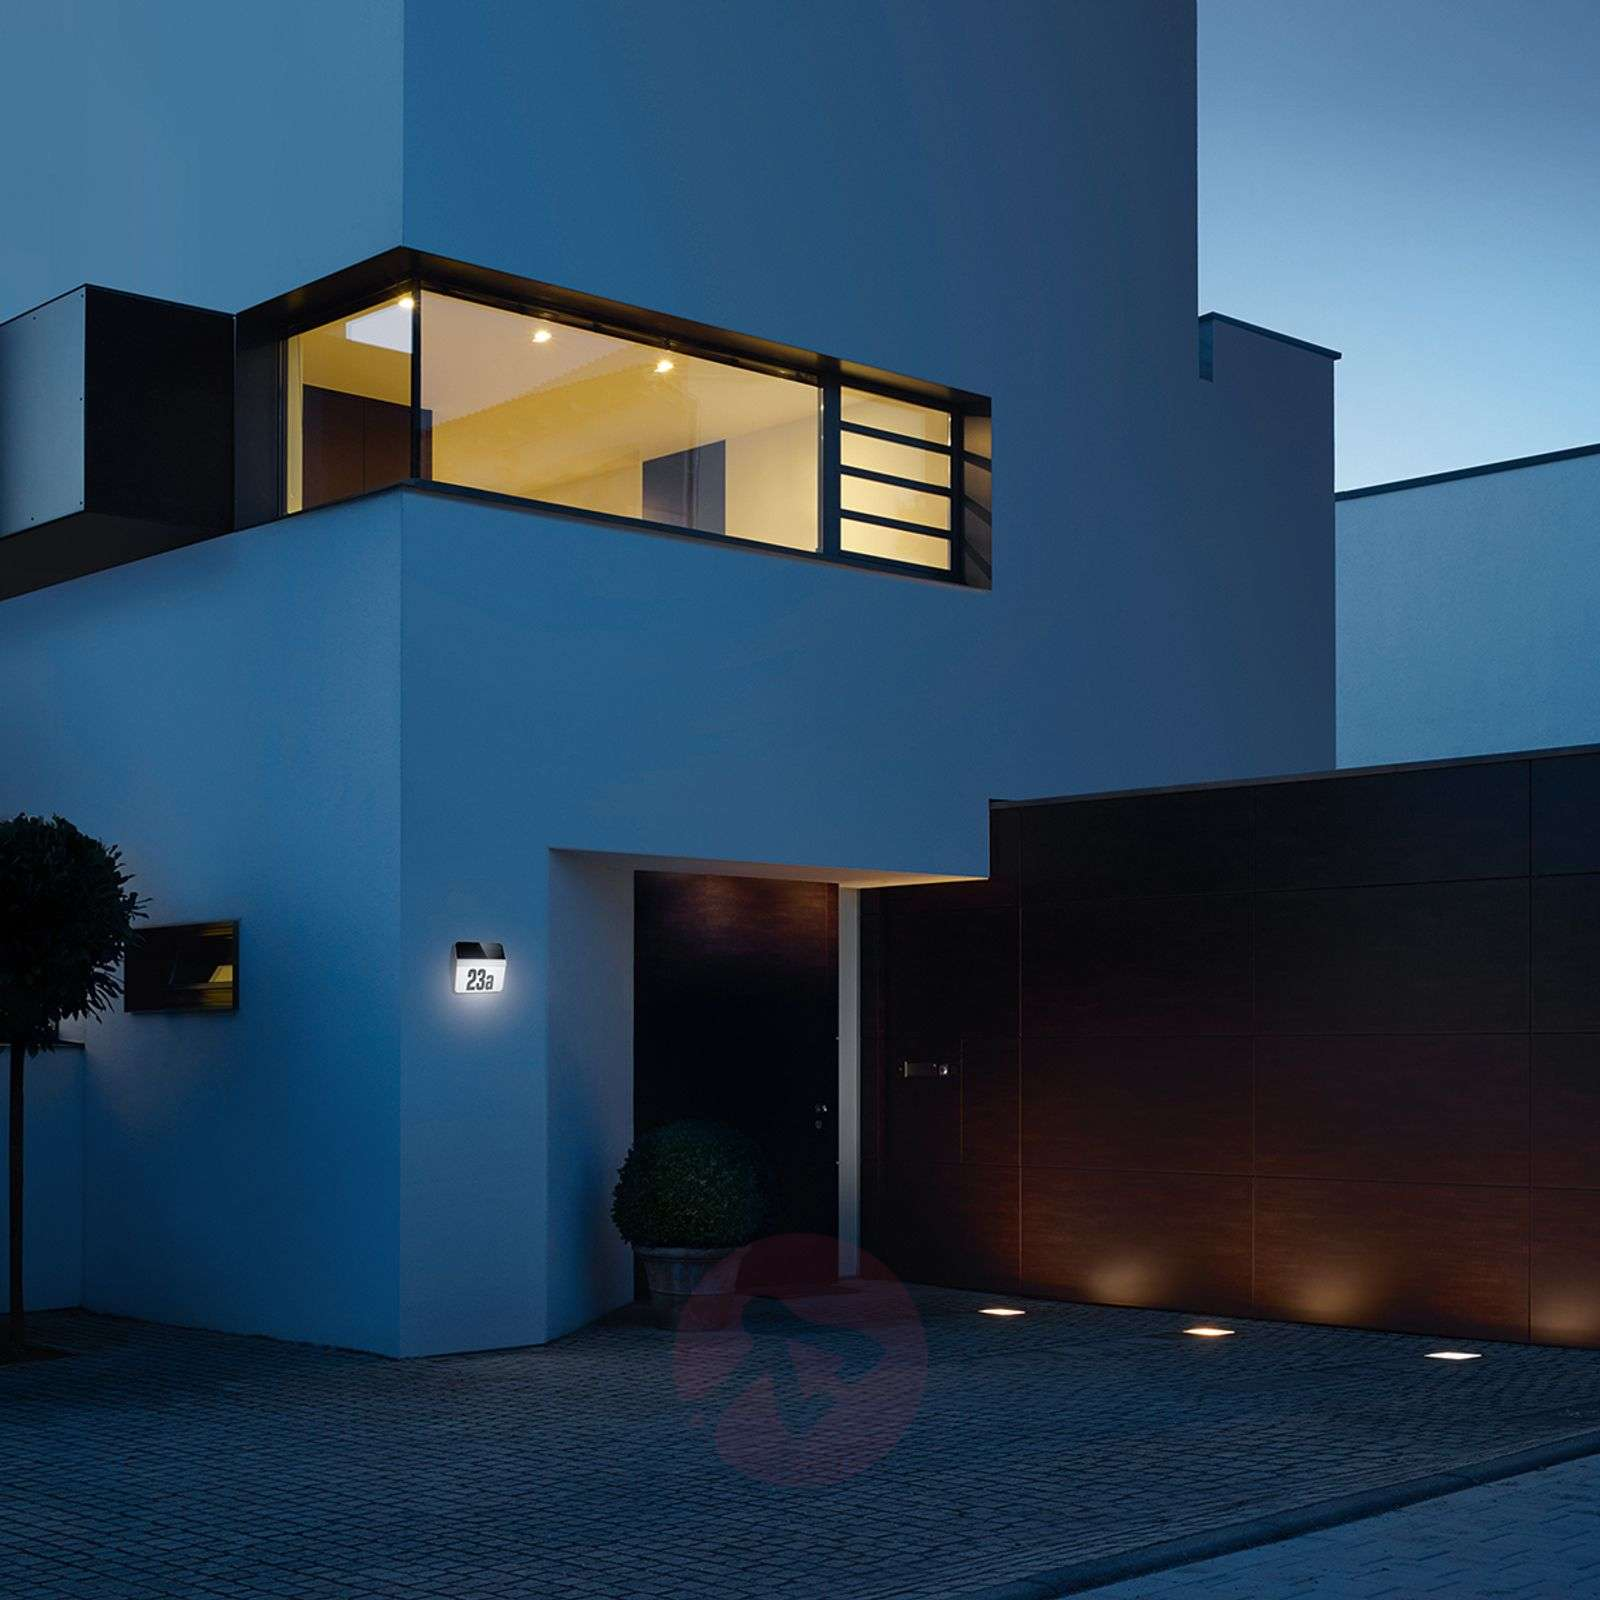 XSolar LH-N LED house number light stainless steel-8505646-01